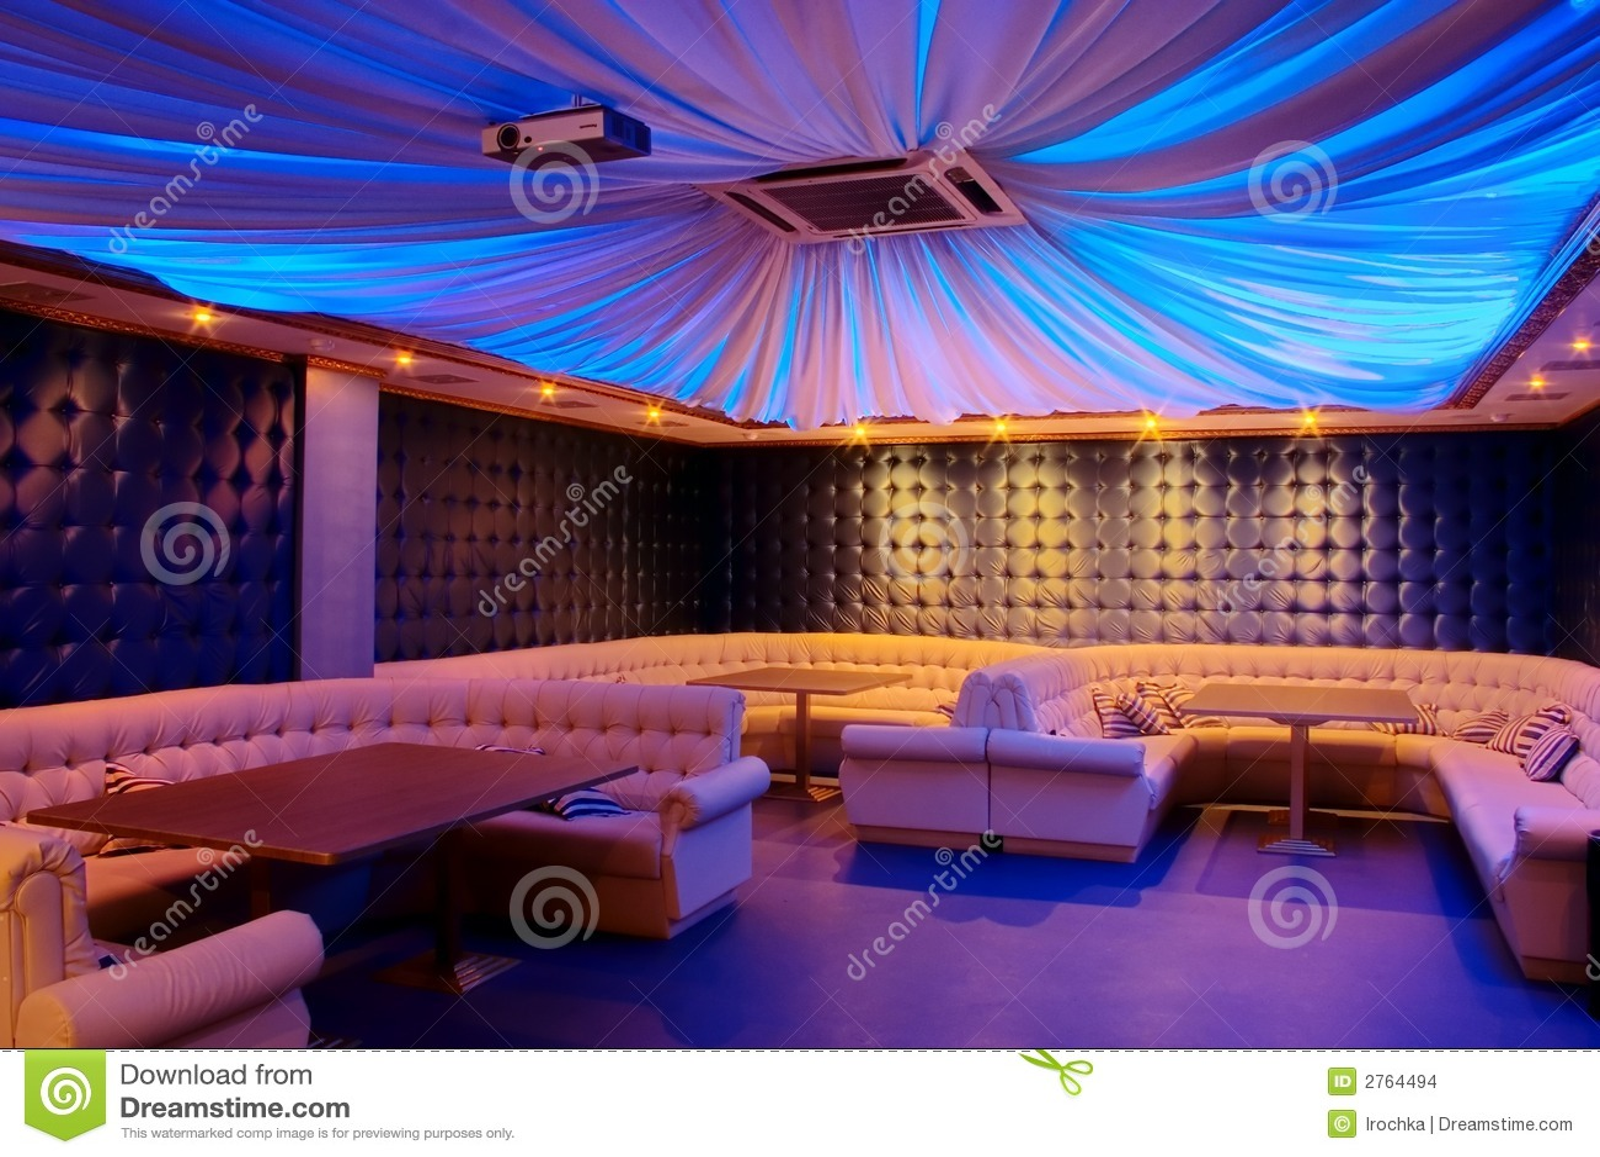 Bar de salon images stock image 2764494 for Zona 5 mobilia no club download